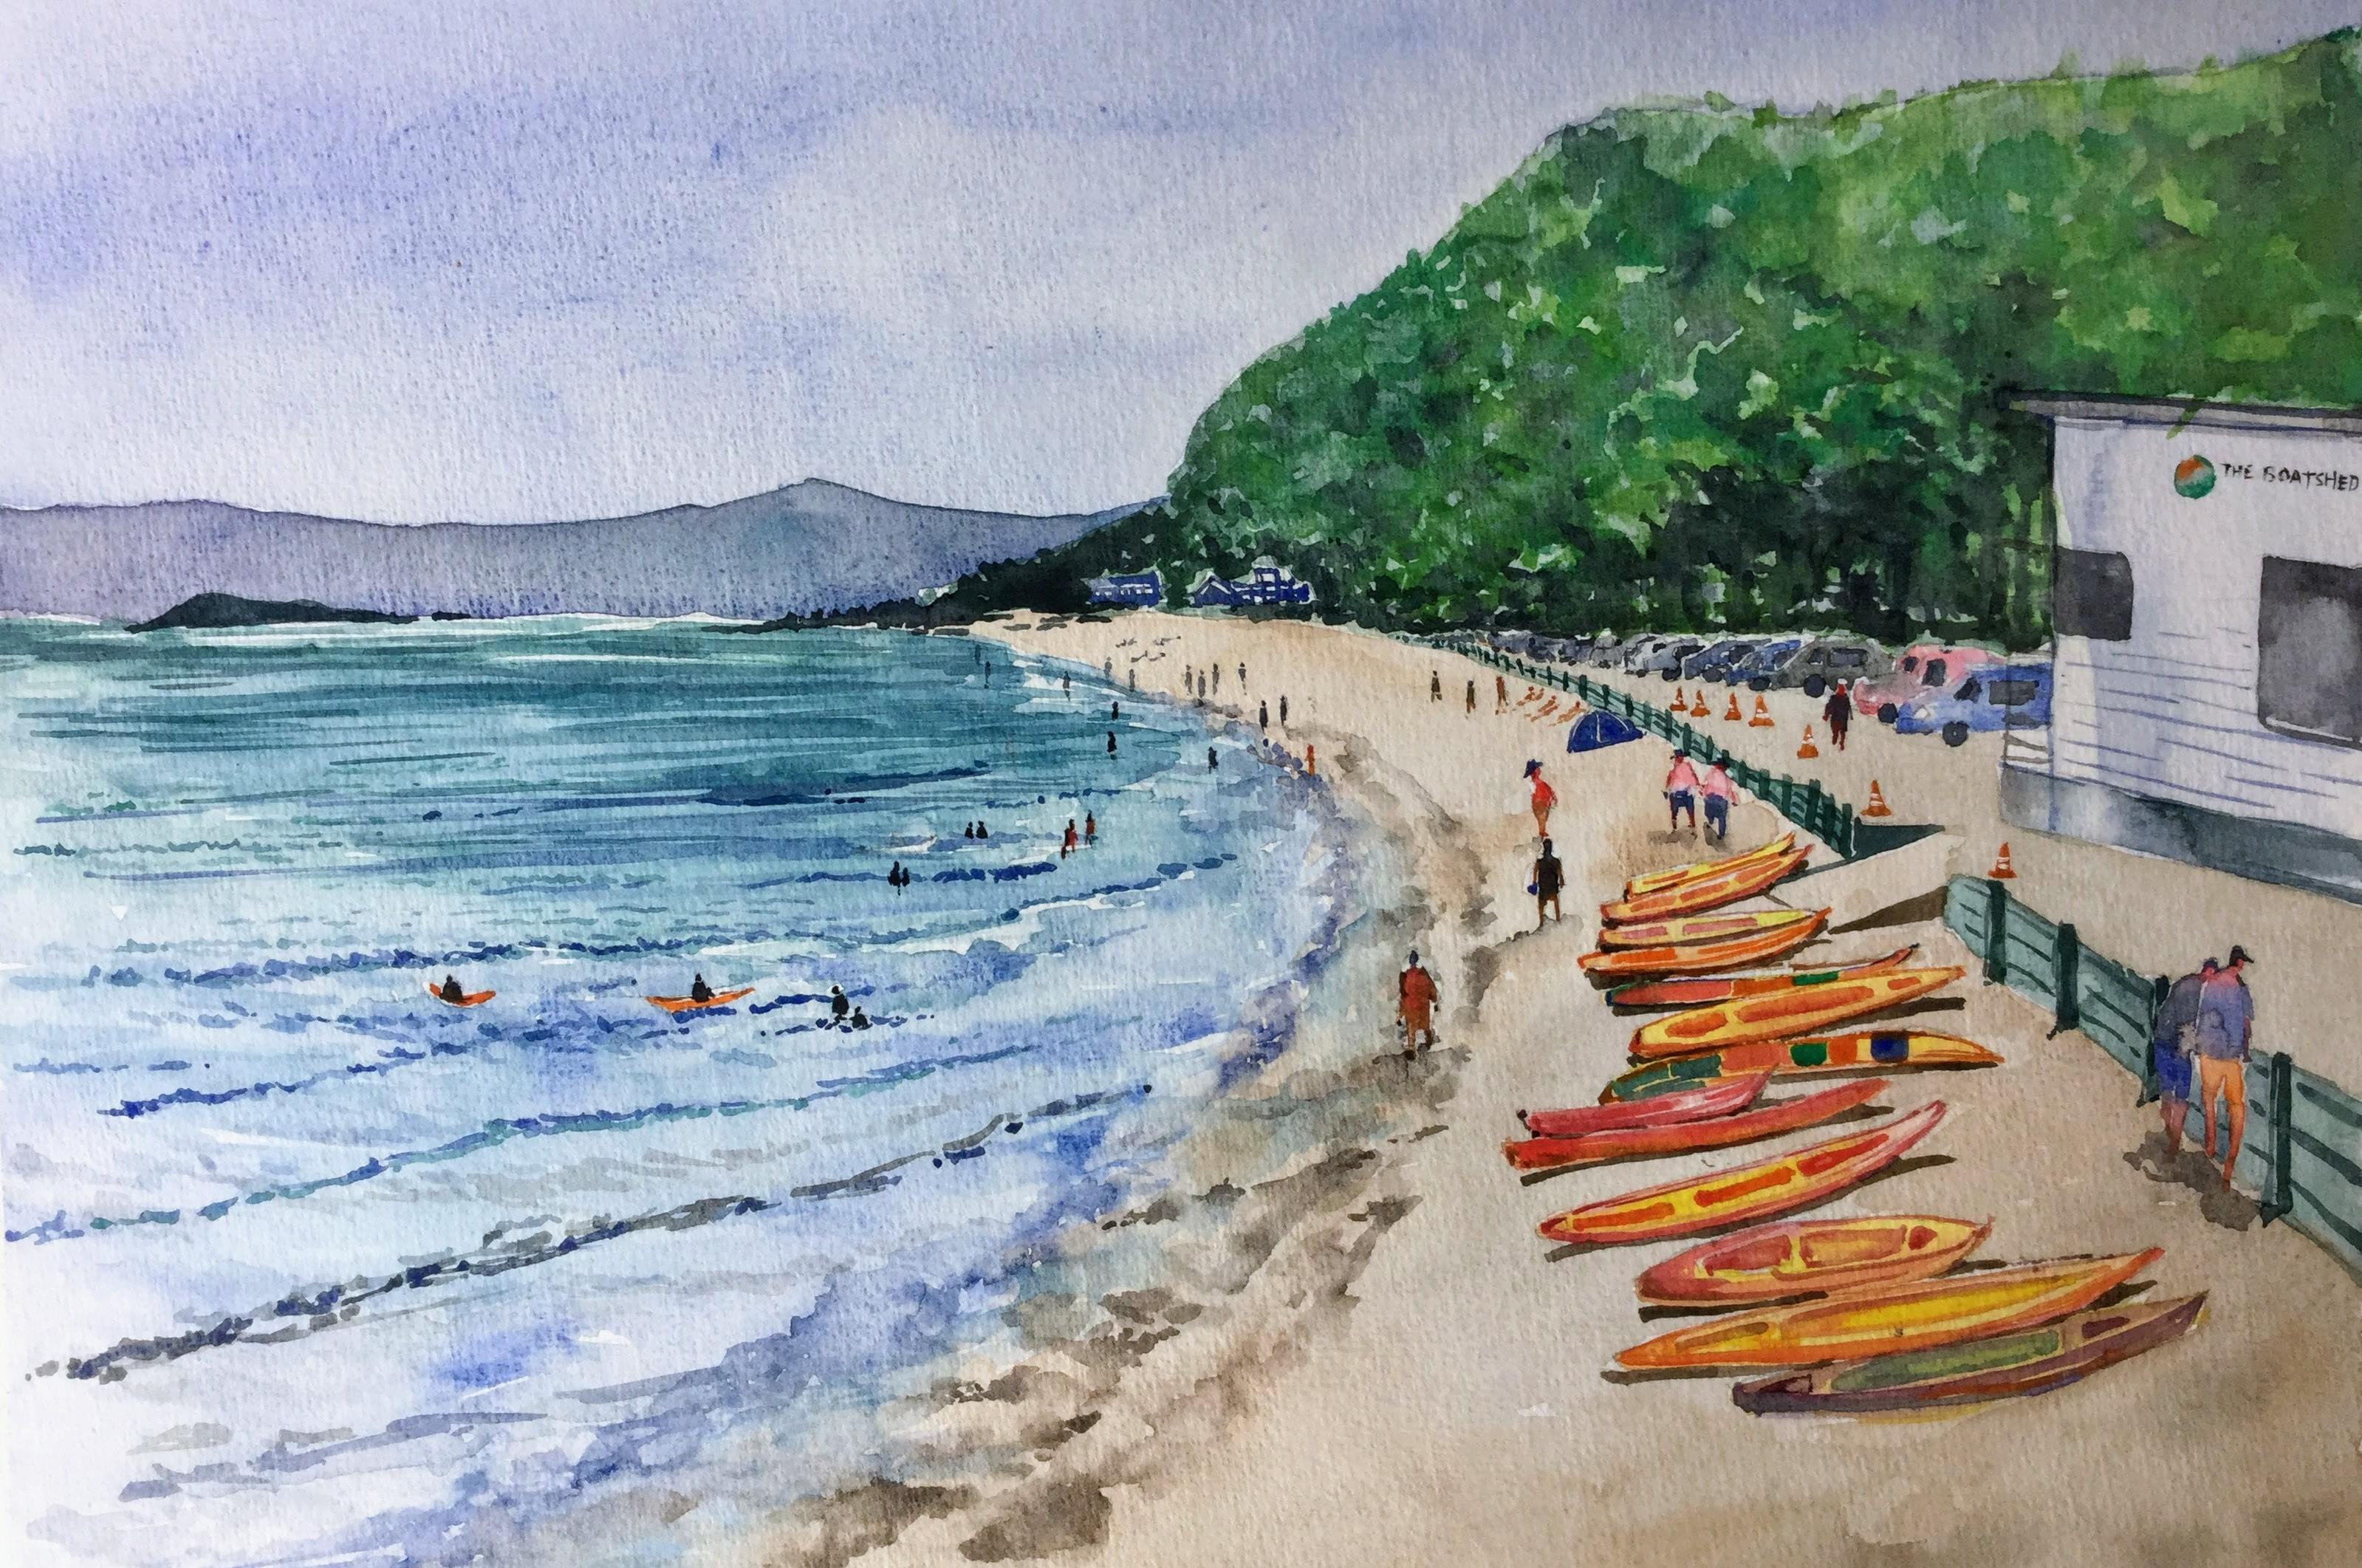 Summer'18 at Eastbourne Beach